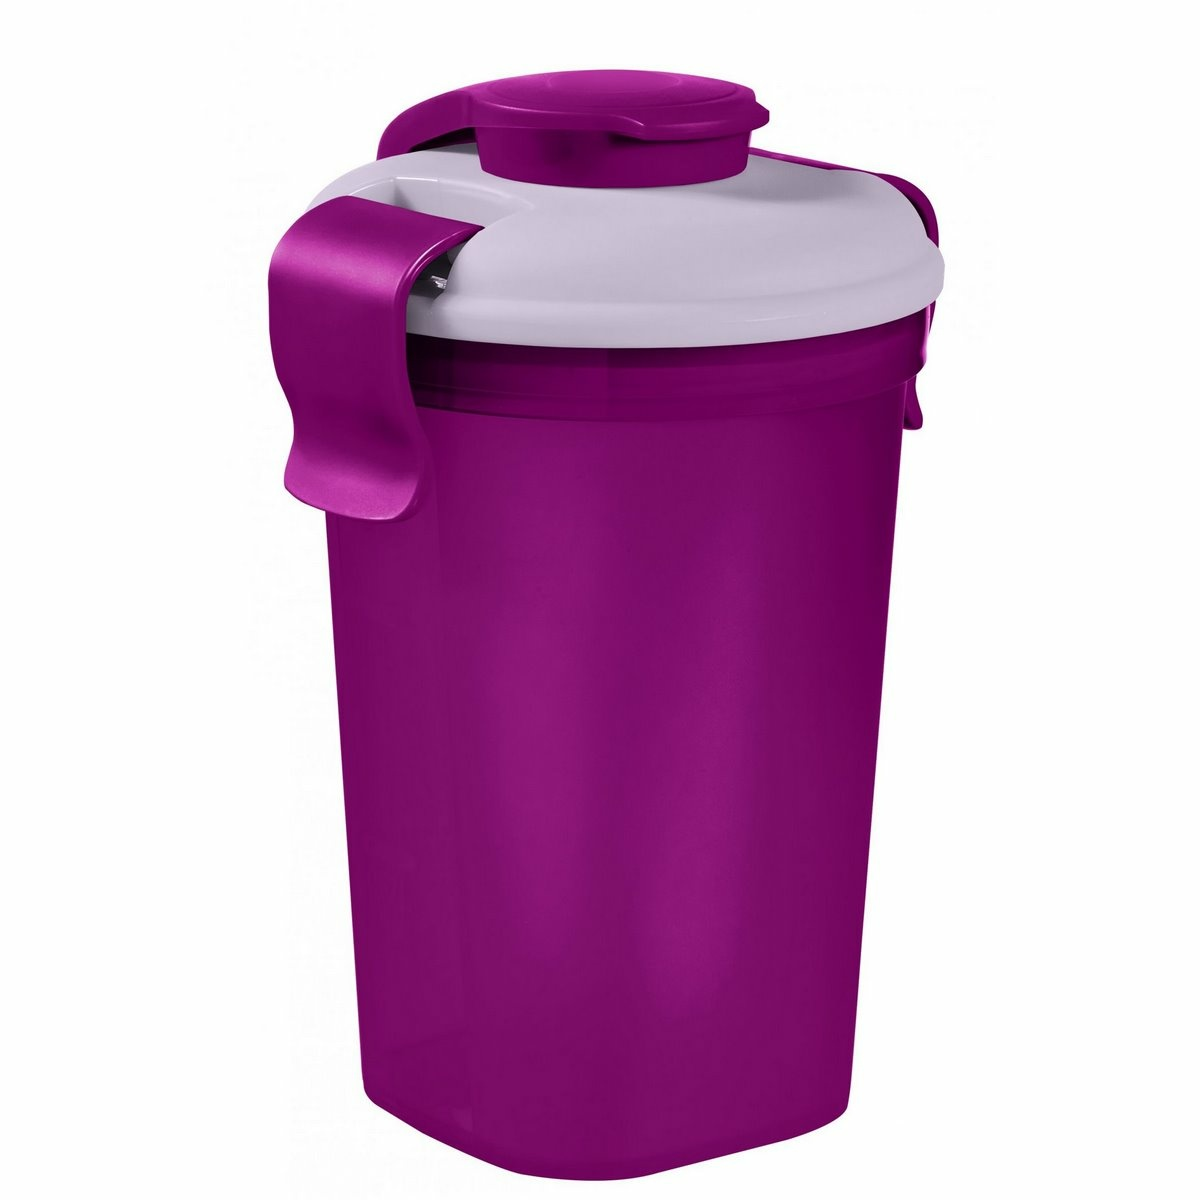 Curver Fľaša na potraviny LUNCH&Go 0,75 l, fialová